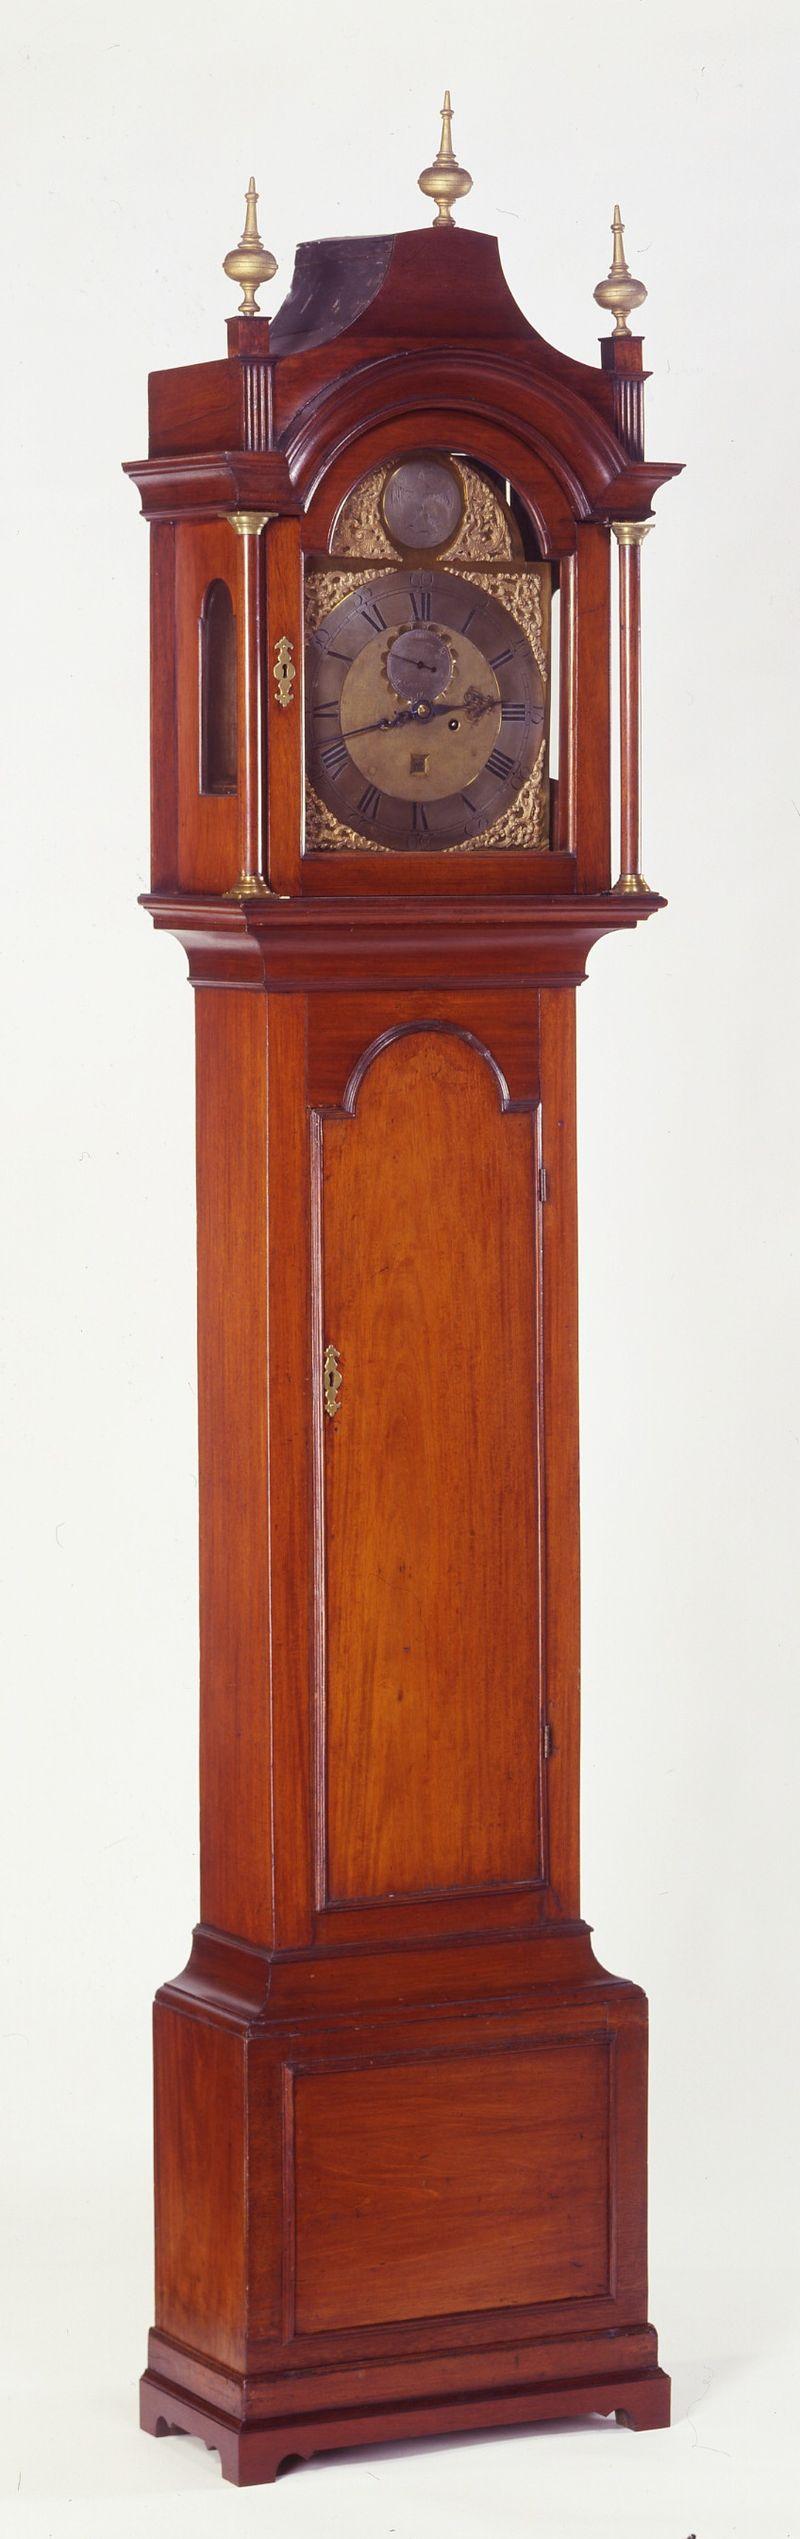 Willard Tall Case Clock cropped